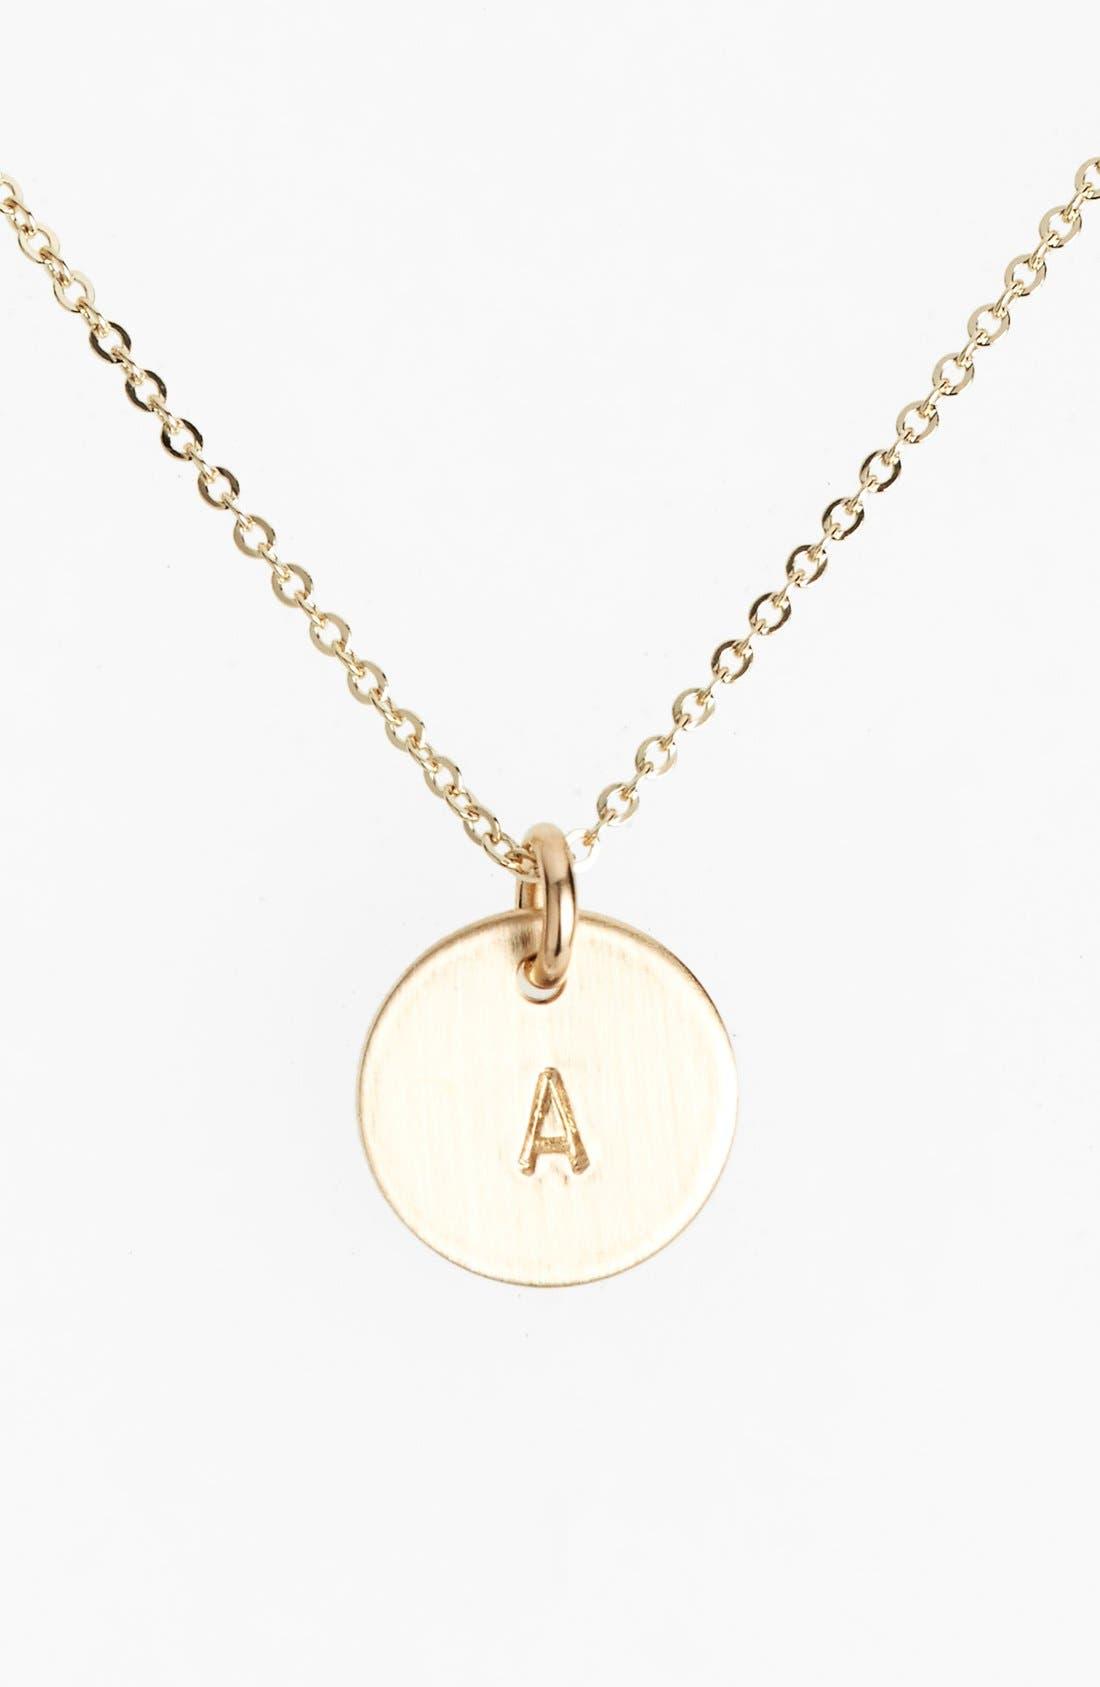 14k-Gold Fill Initial Mini Circle Necklace,                             Main thumbnail 1, color,                             14K GOLD FILL A